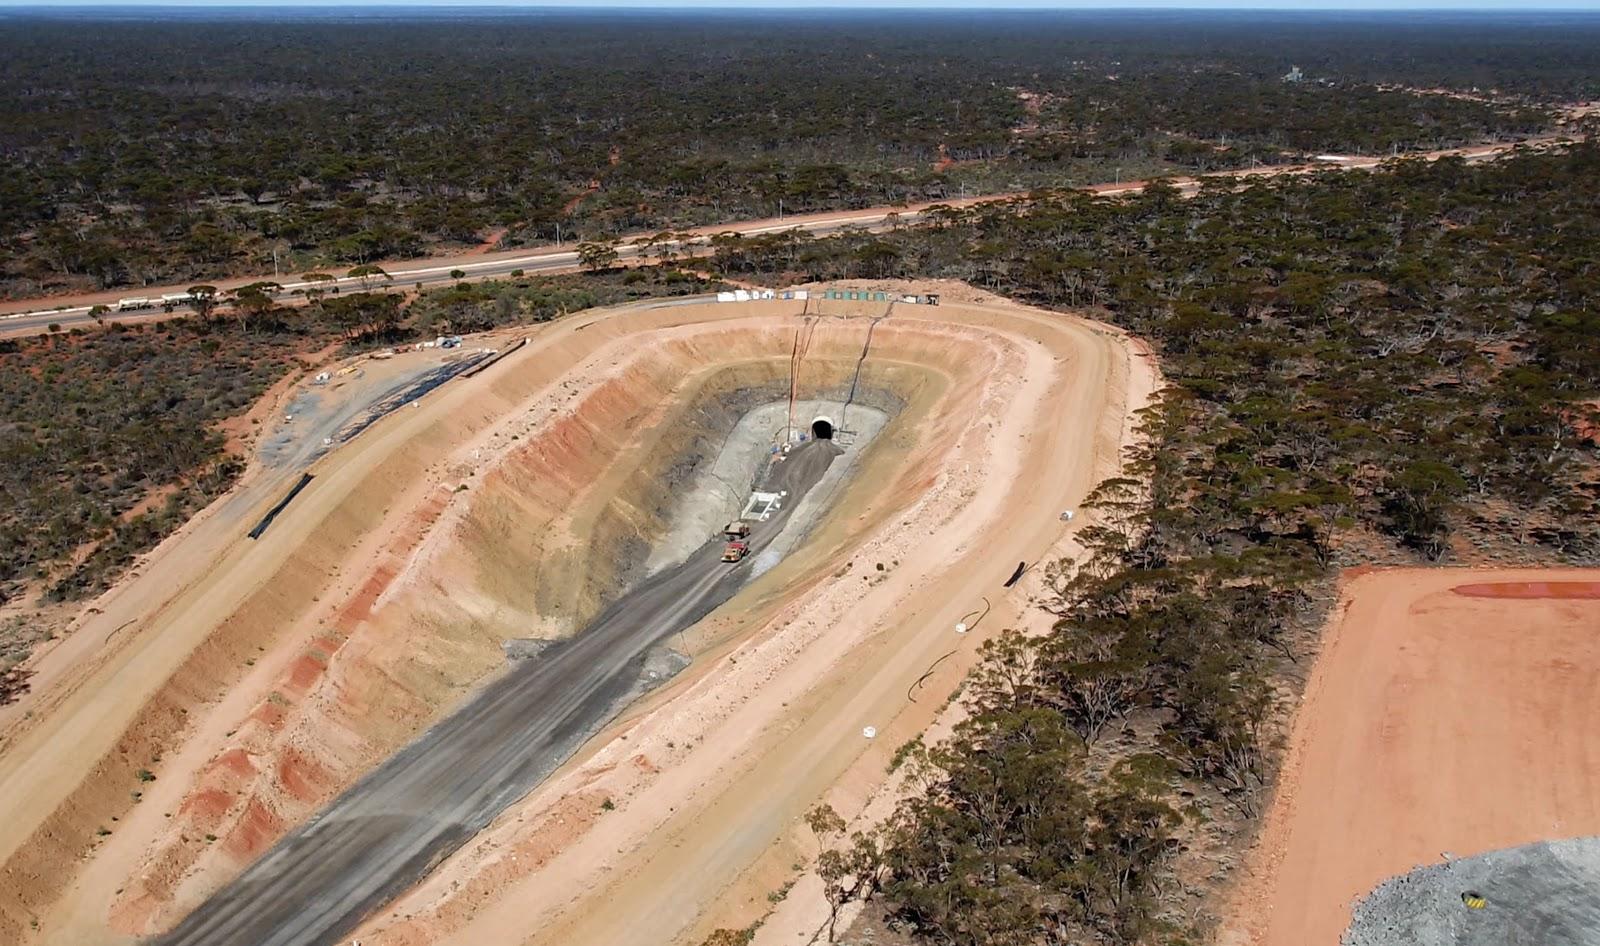 IGO – Exploration and Mining